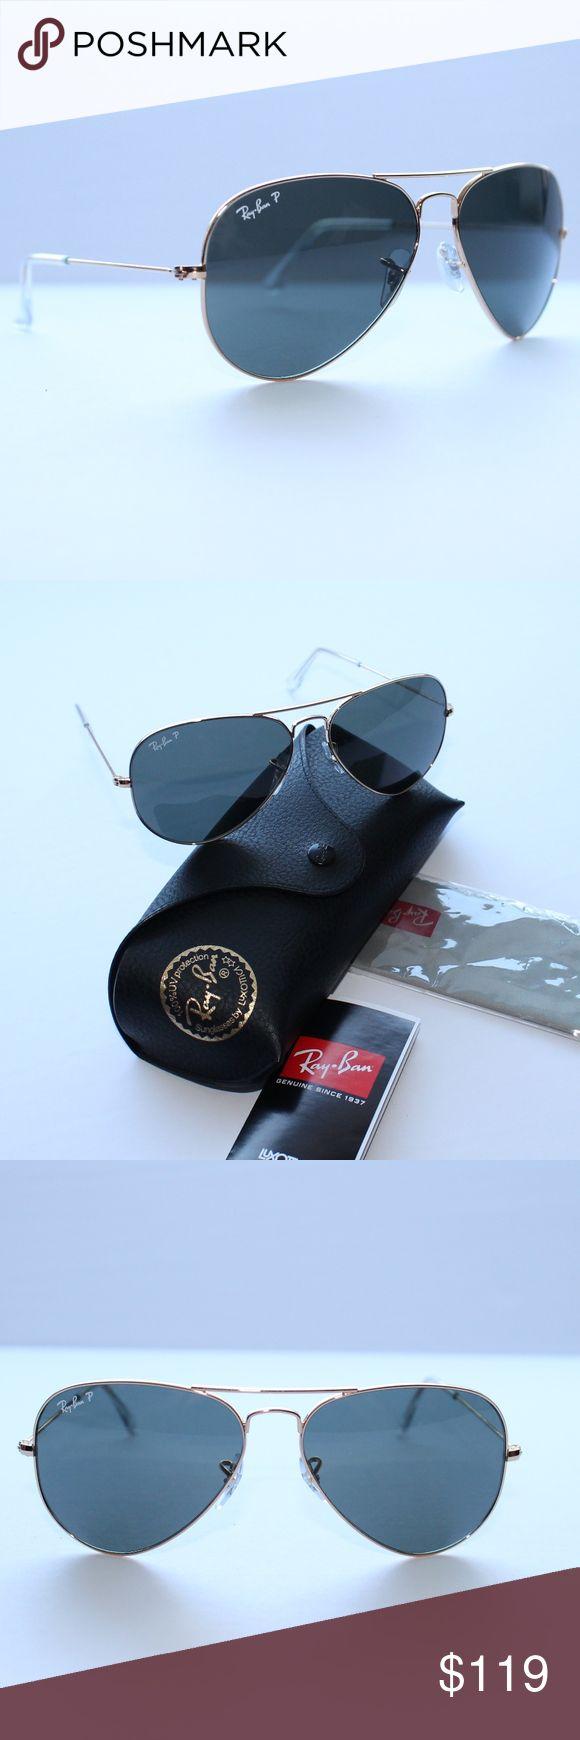 Ray-Ban Aviator Classic Gold/Green Polarized RB302 Brand New 100% Authentic Ray-Ban Aviator Classic Gold/Green Polarized RB3025 L0205 58-14 Ray-Ban Accessories Sunglasses